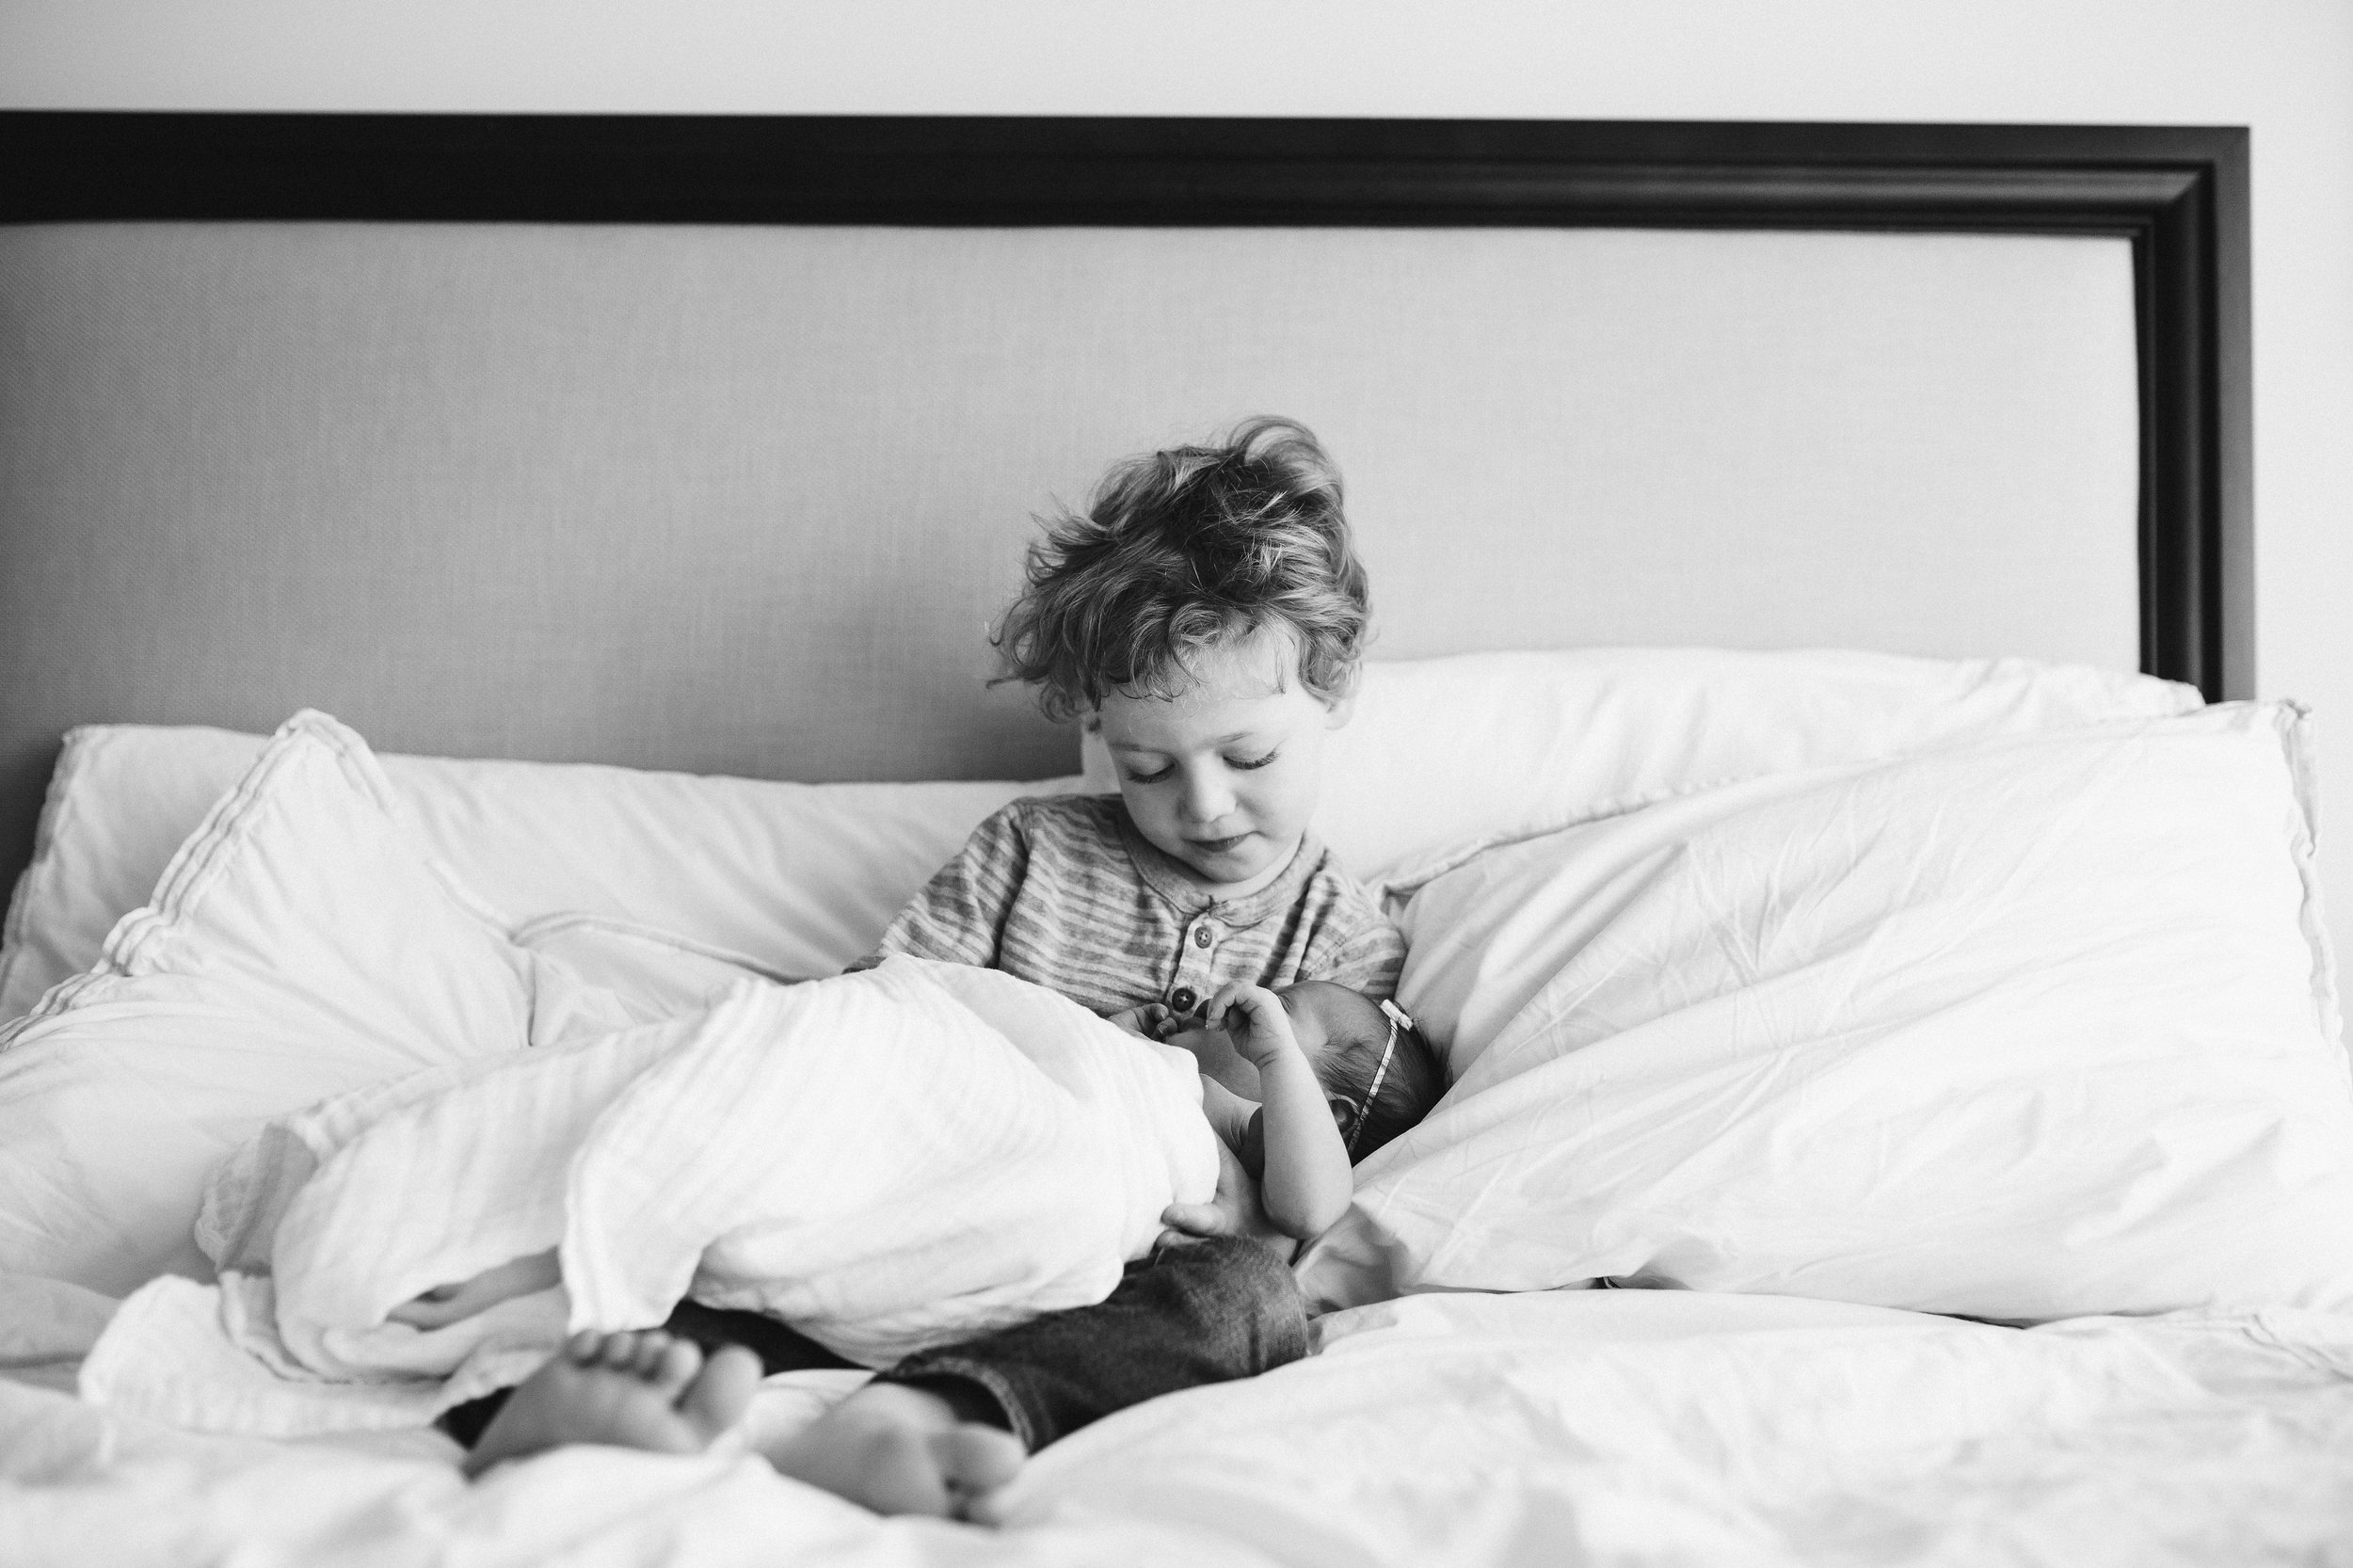 verbuch-family_brooklyn-ny-newborn-photography-6.jpg